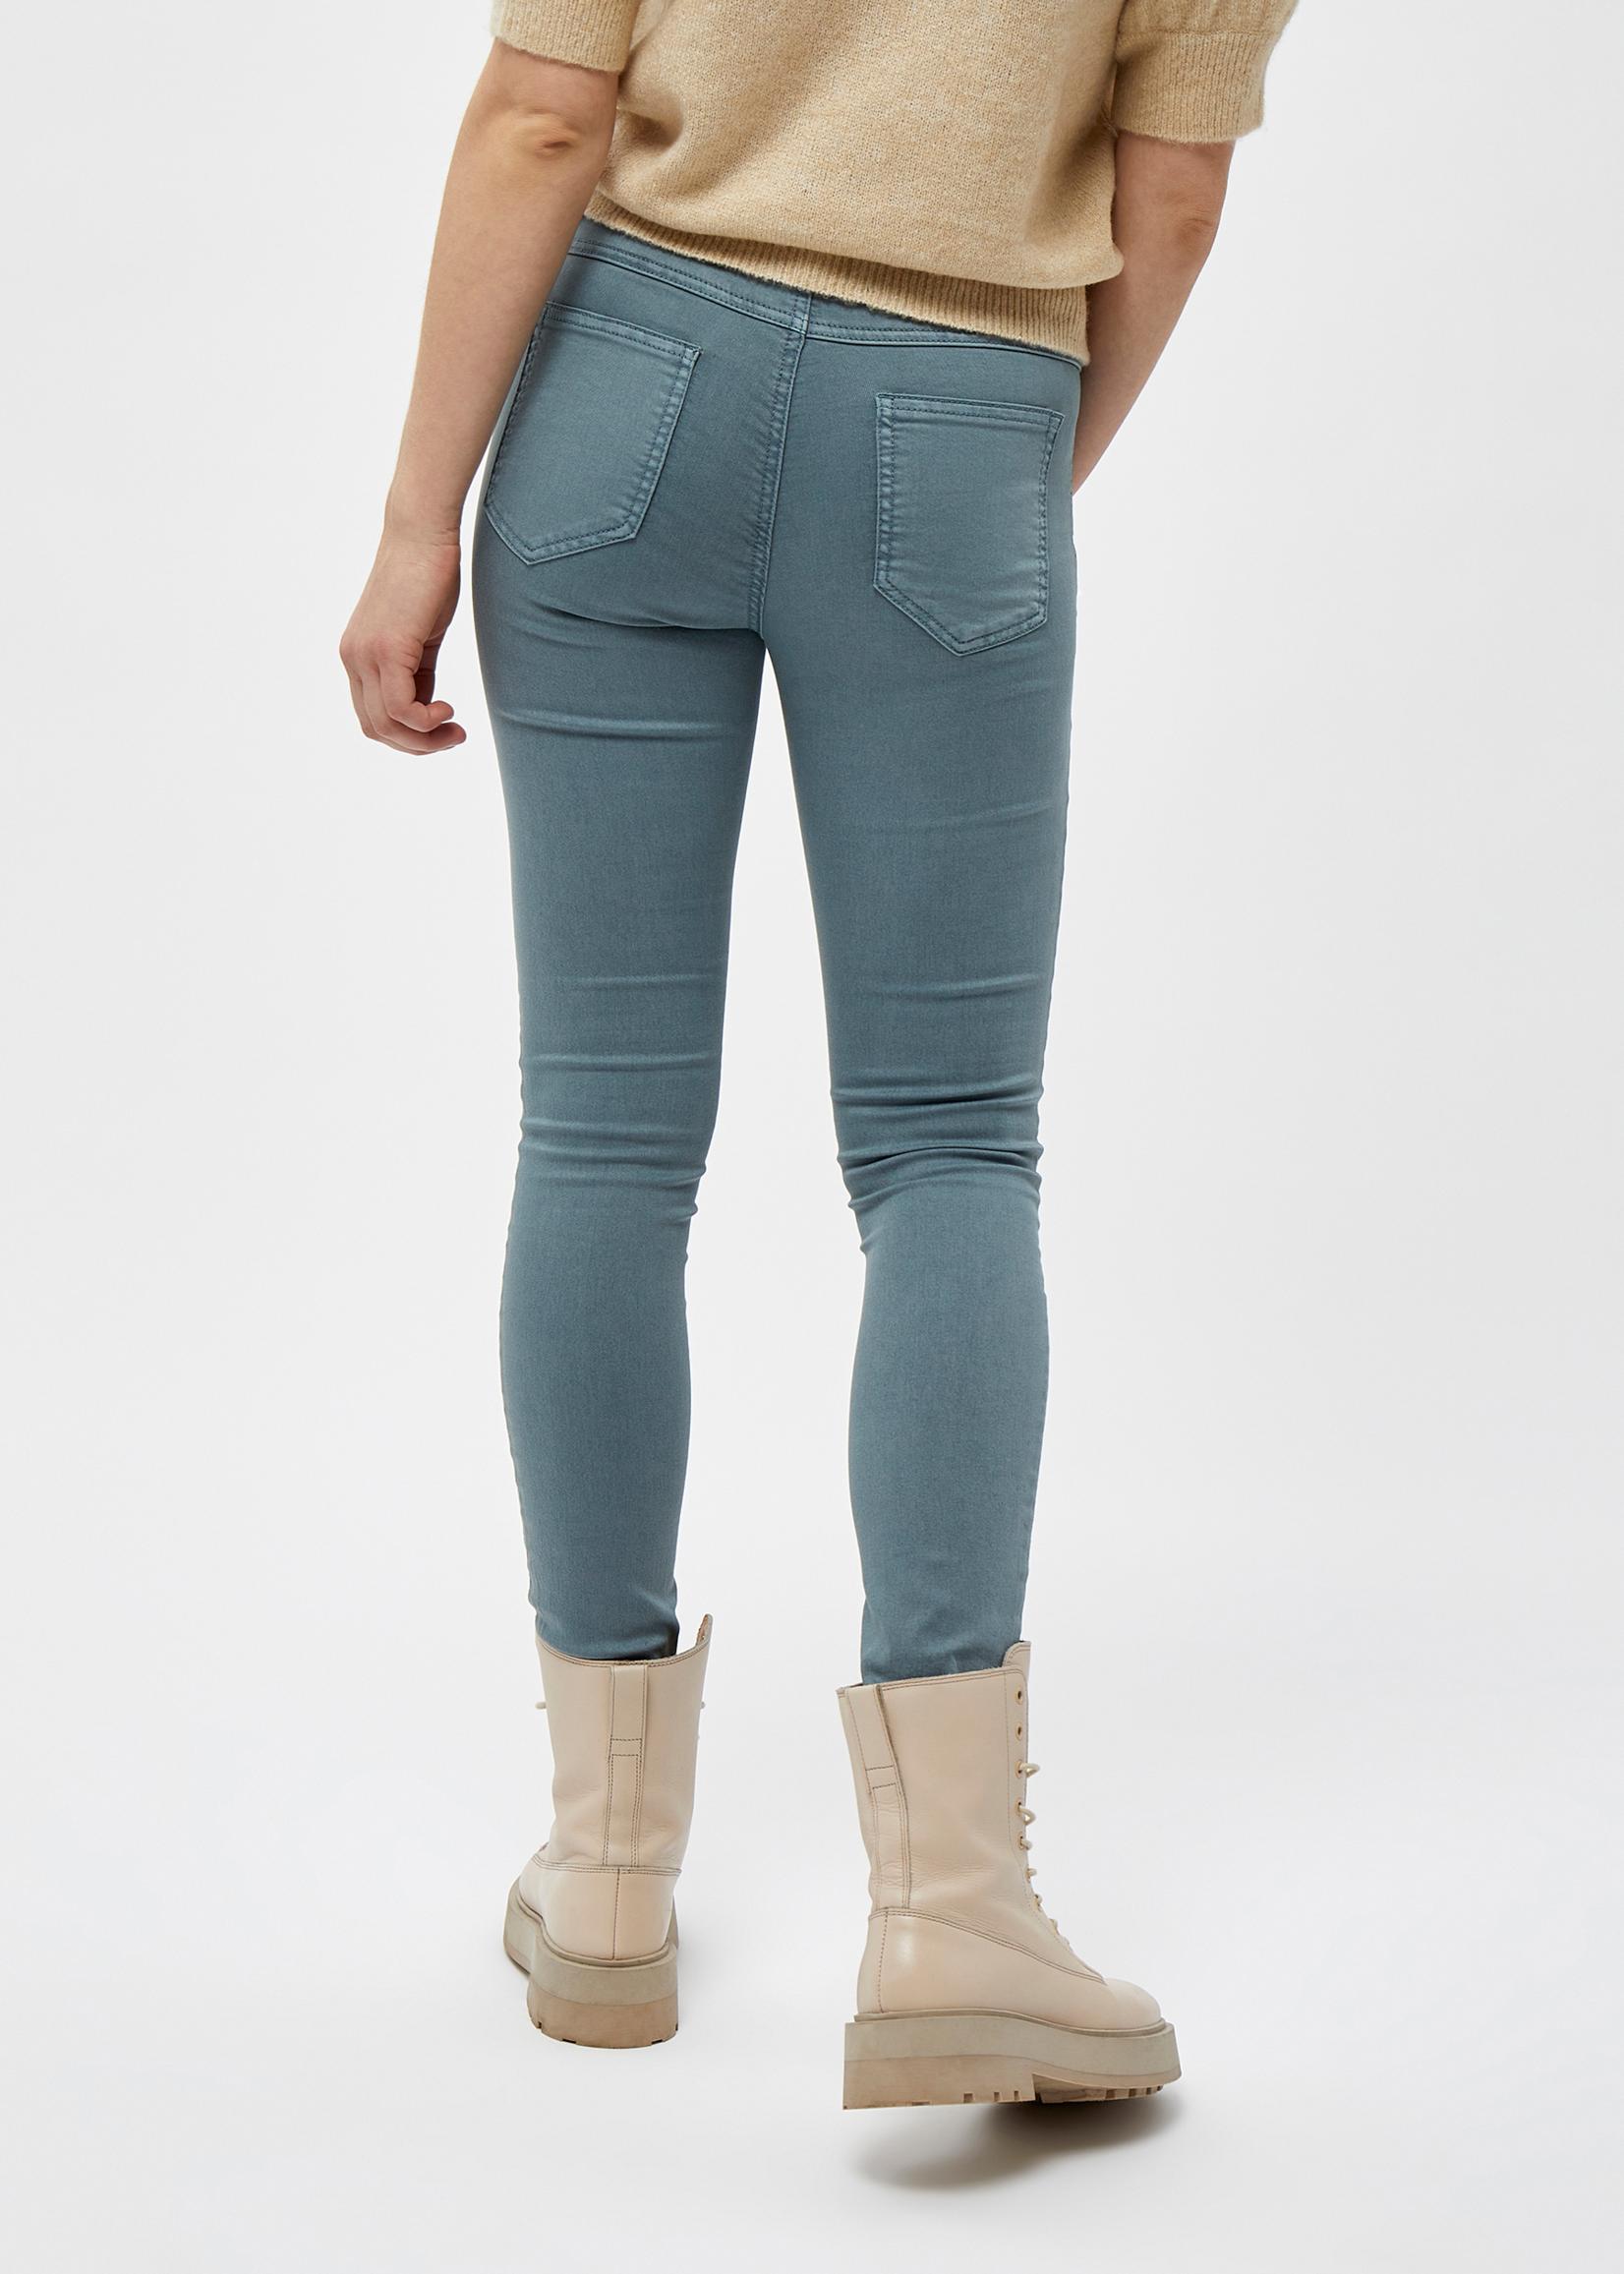 Desires Desires Lola Jeans Dye